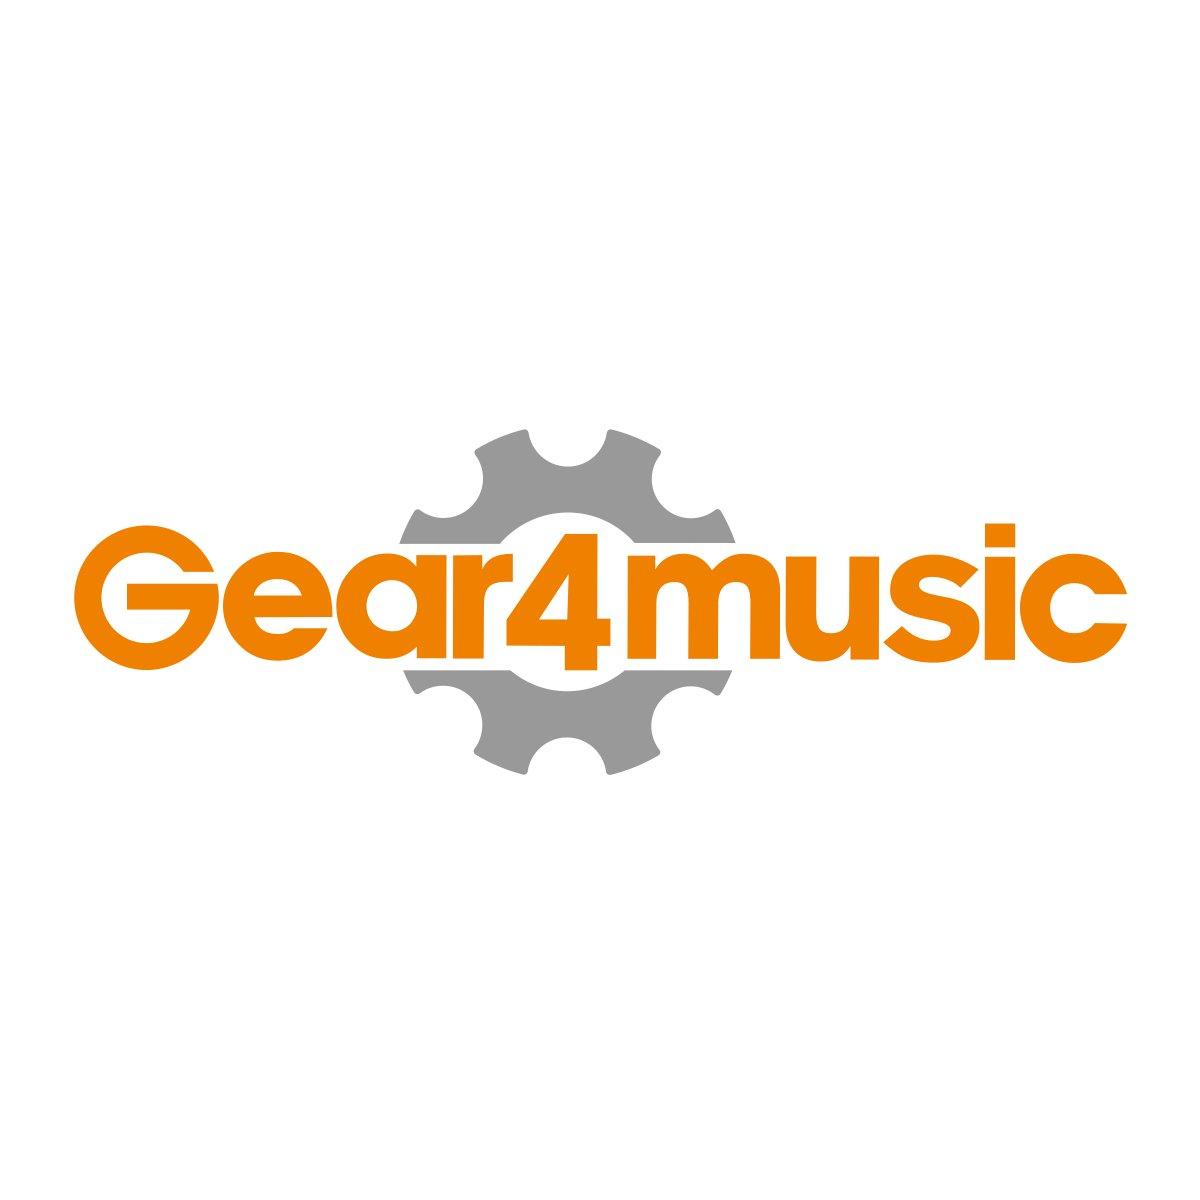 Student 4/4 Storlek Cello med fodral av Gear4Music, Svart